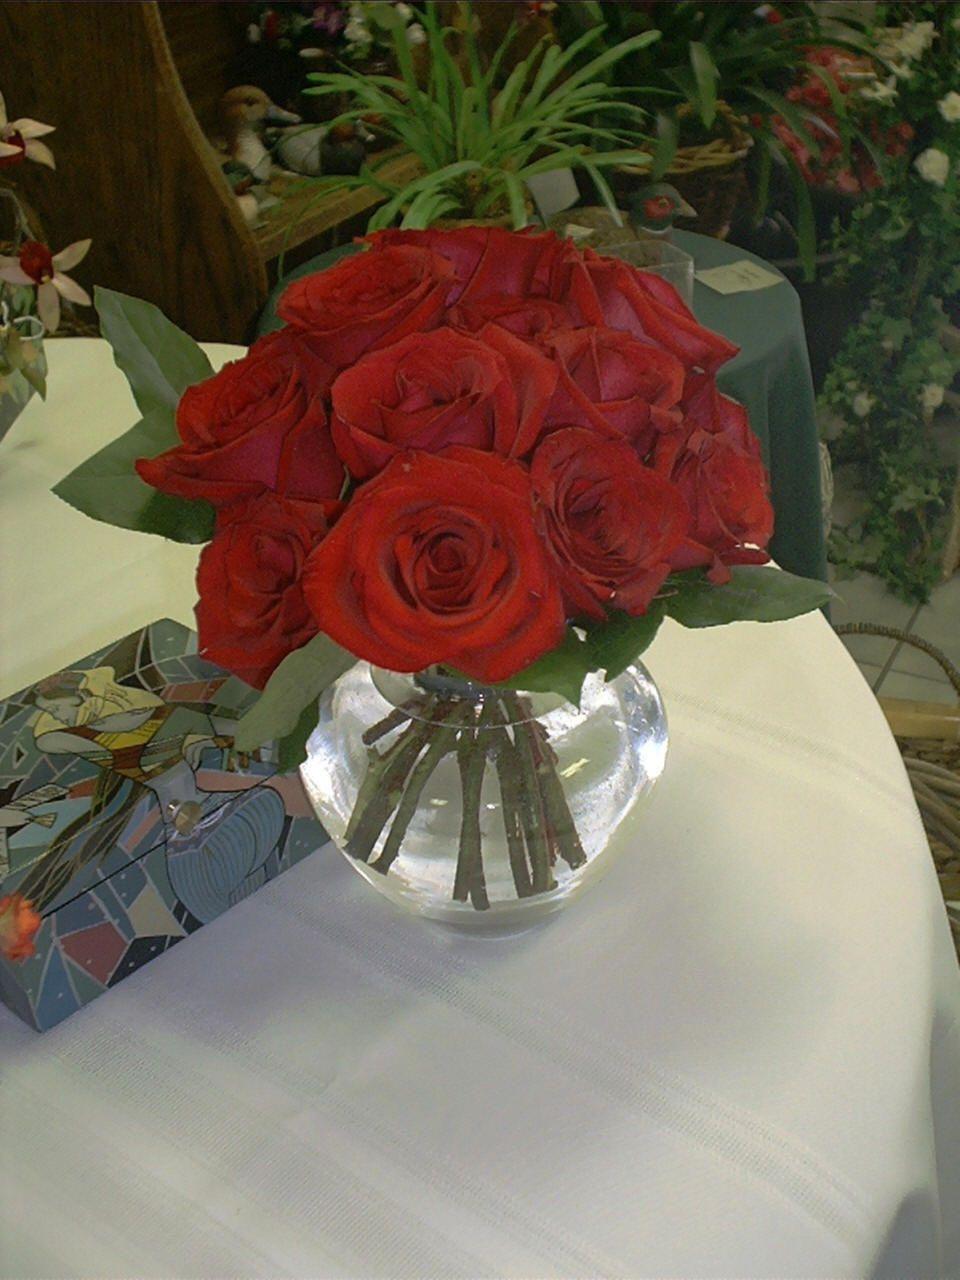 Flower Delivery Redding Ca